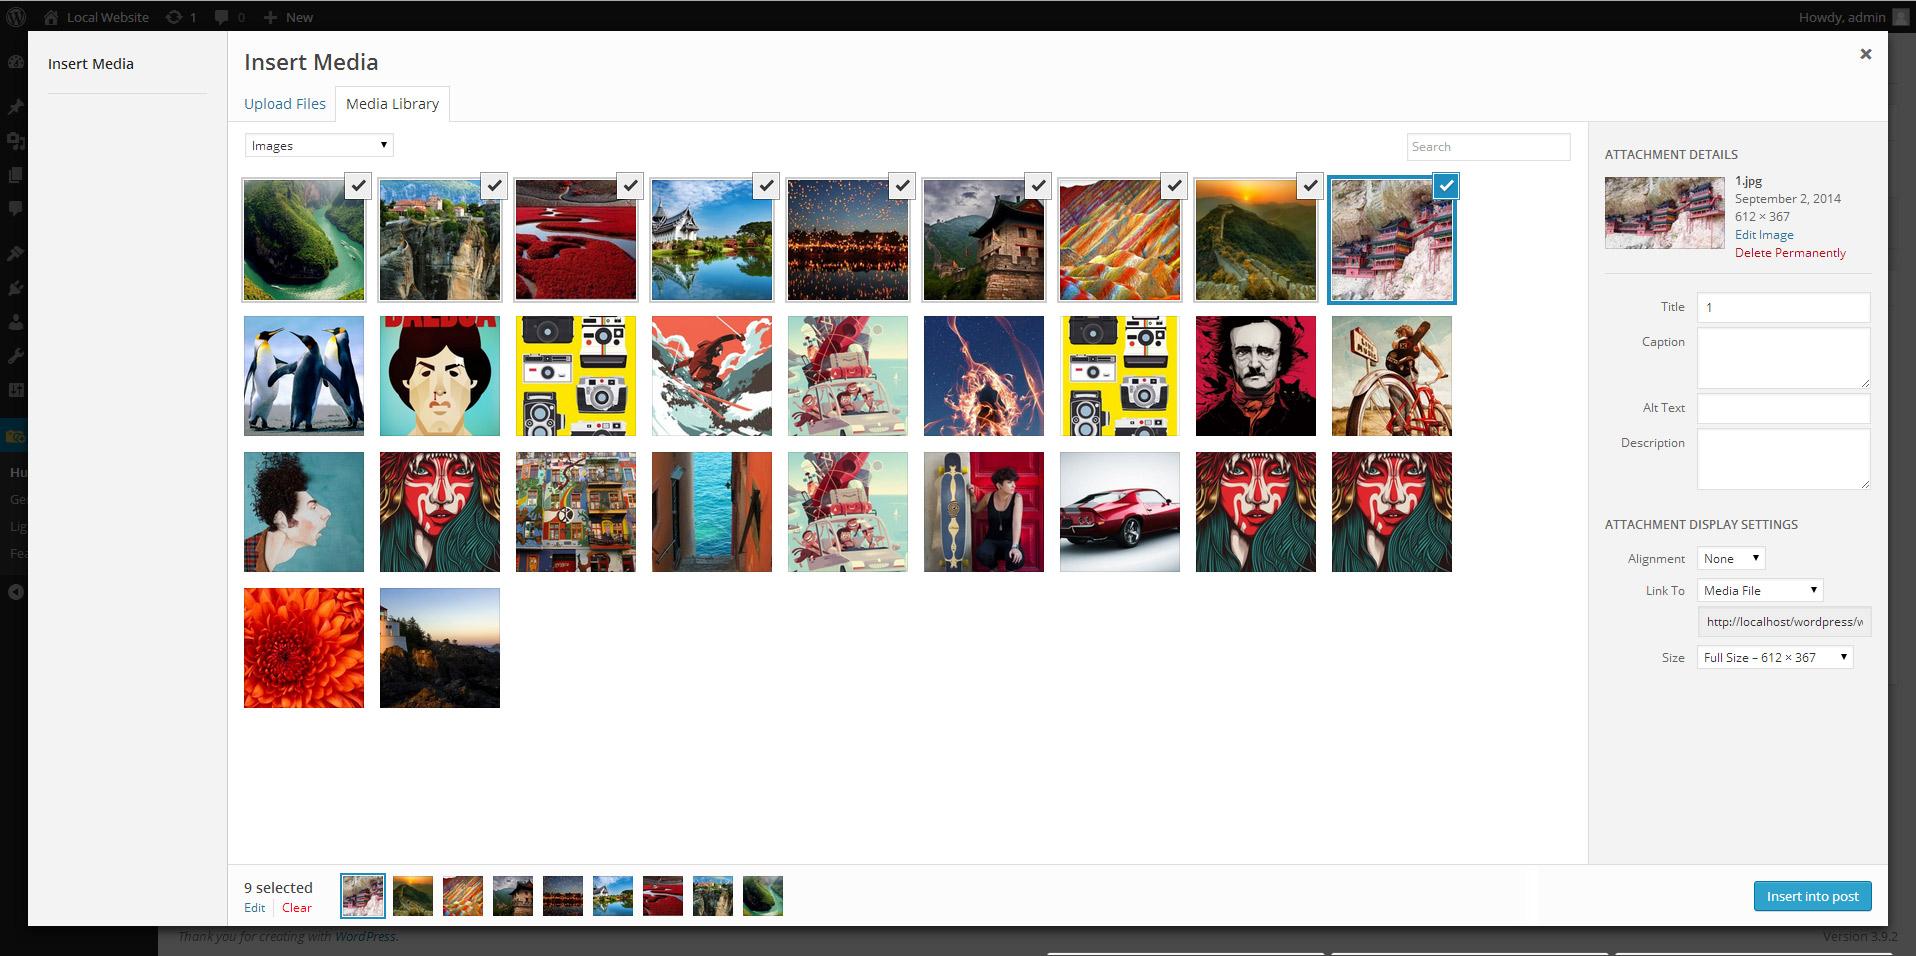 "<a href=""https://wordpress.org/plugins/gallery-images/"">WordPress Image Gallery</a> - Image Gallery uploader"